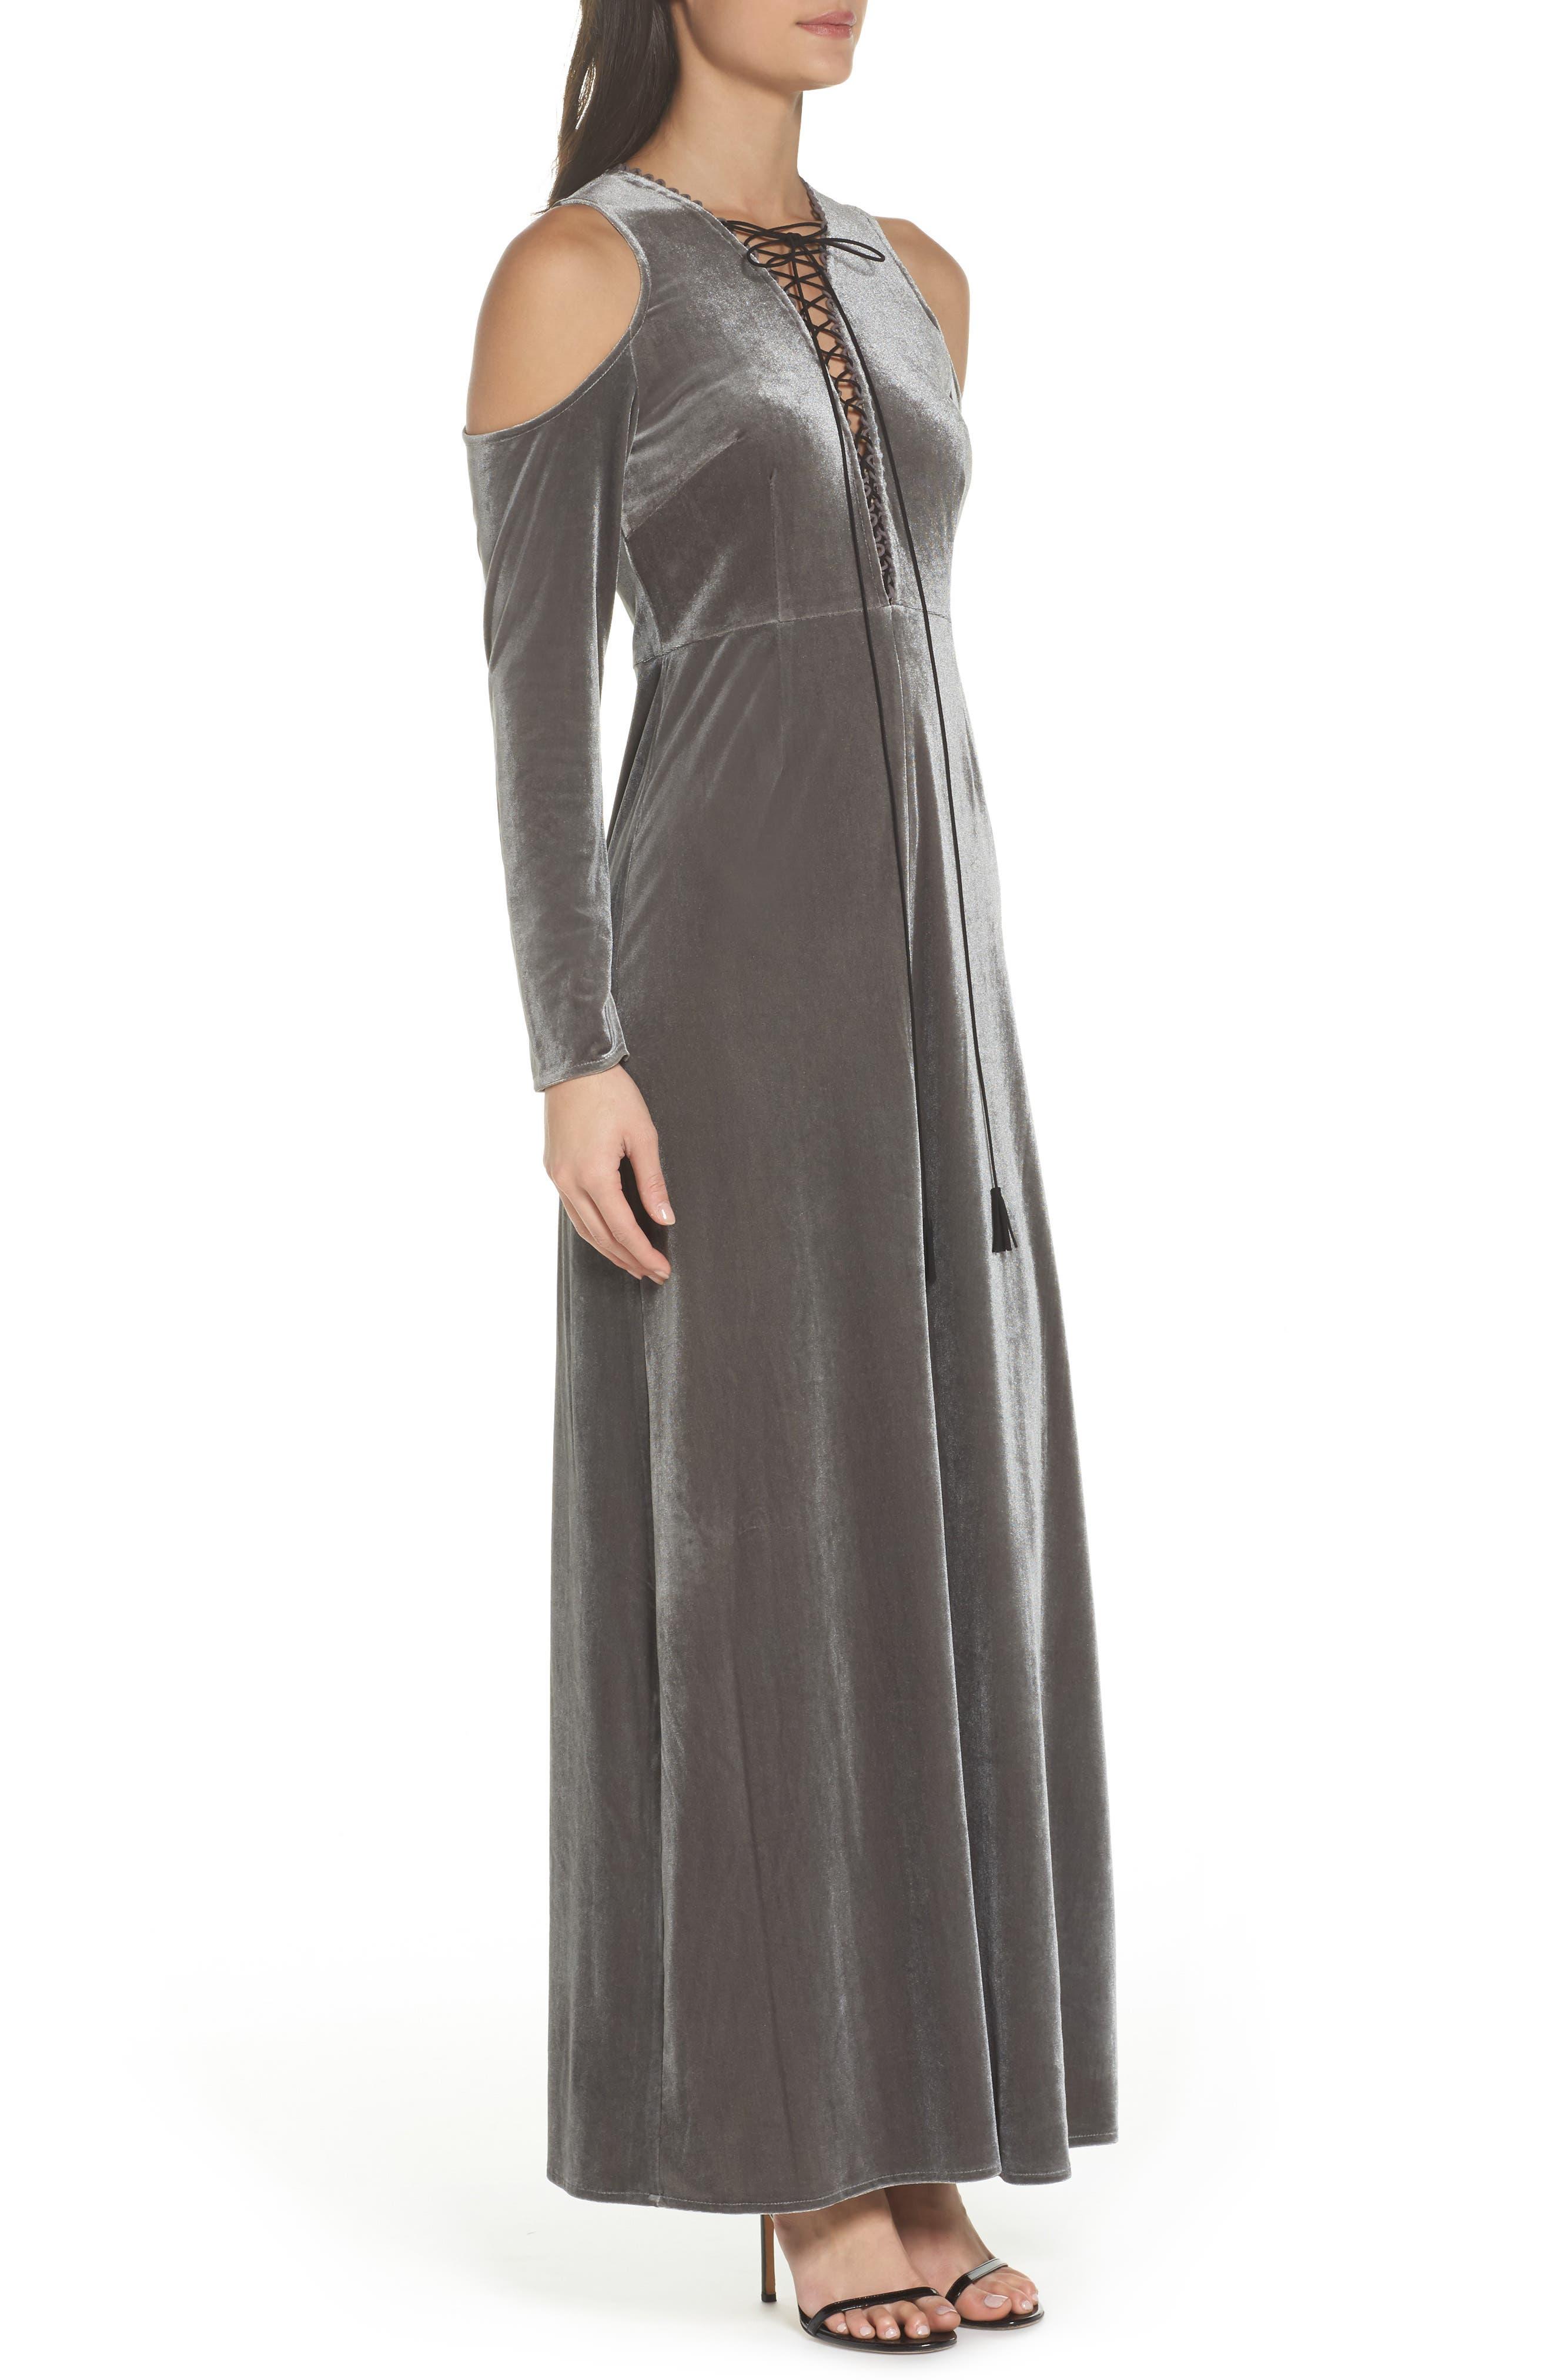 Velvet Lace Up Dress,                             Alternate thumbnail 3, color,                             039